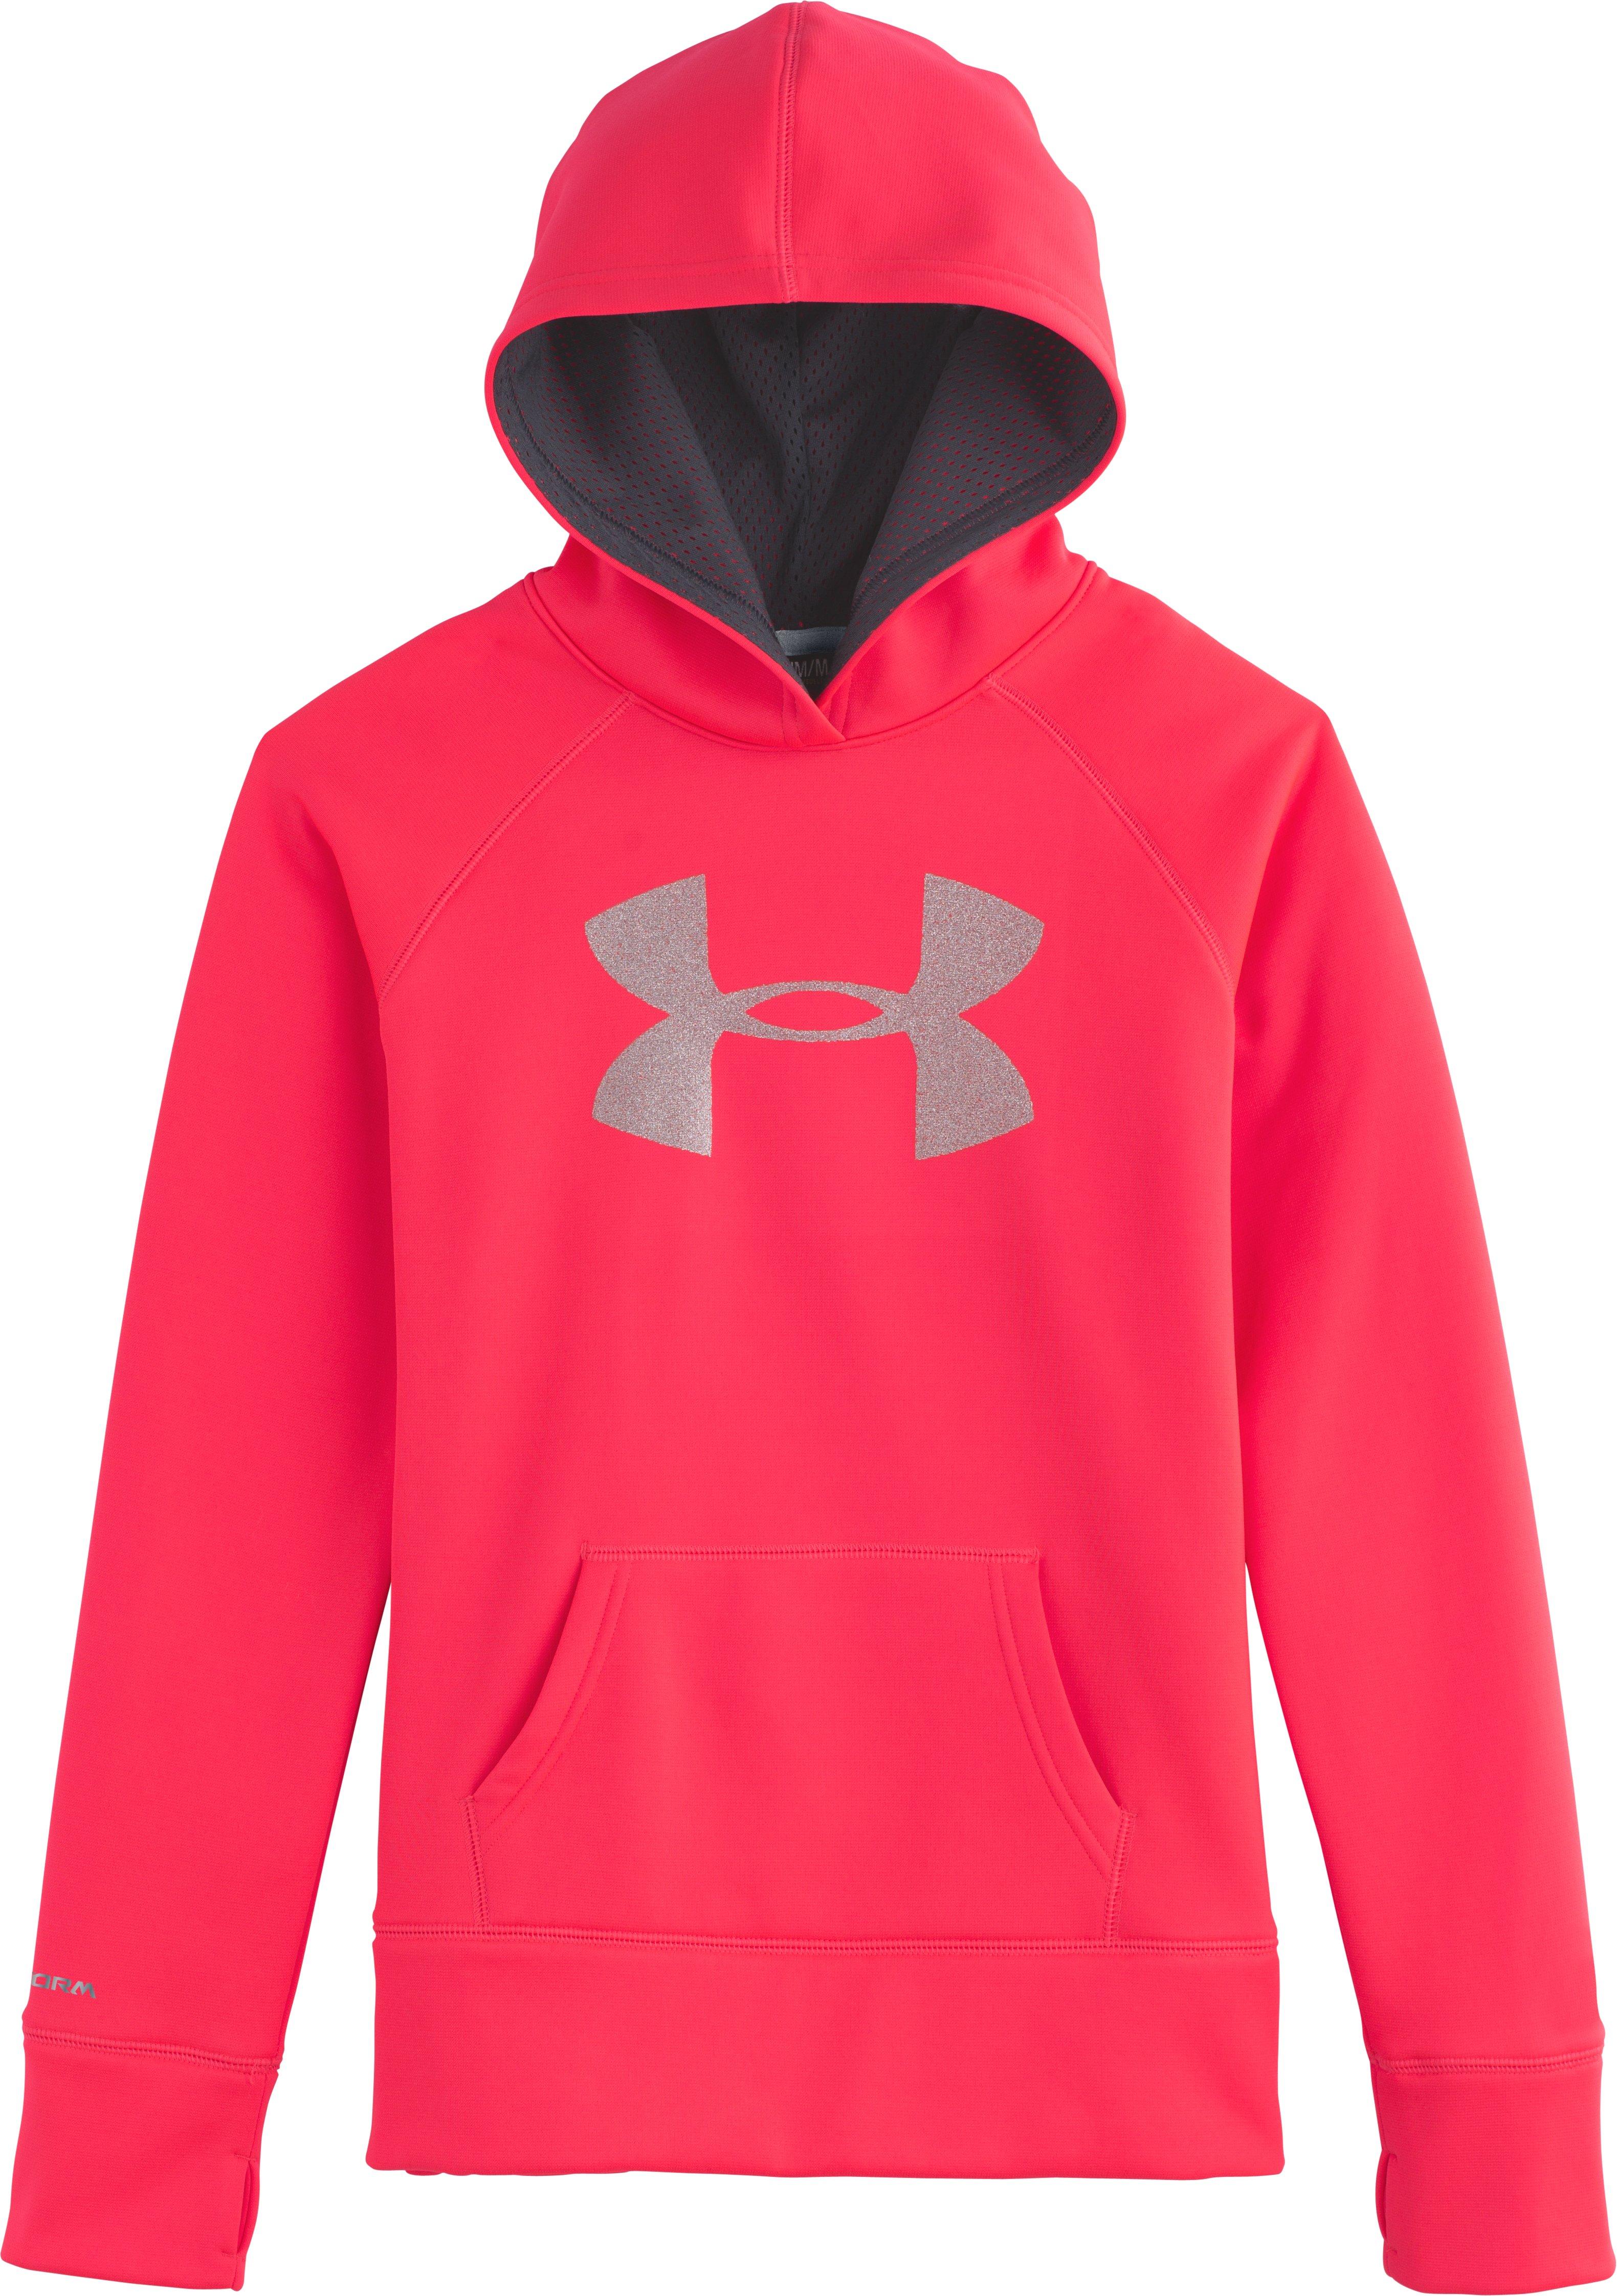 Girls' Armour® Fleece Storm Big Logo Hoodie | Under Armour US